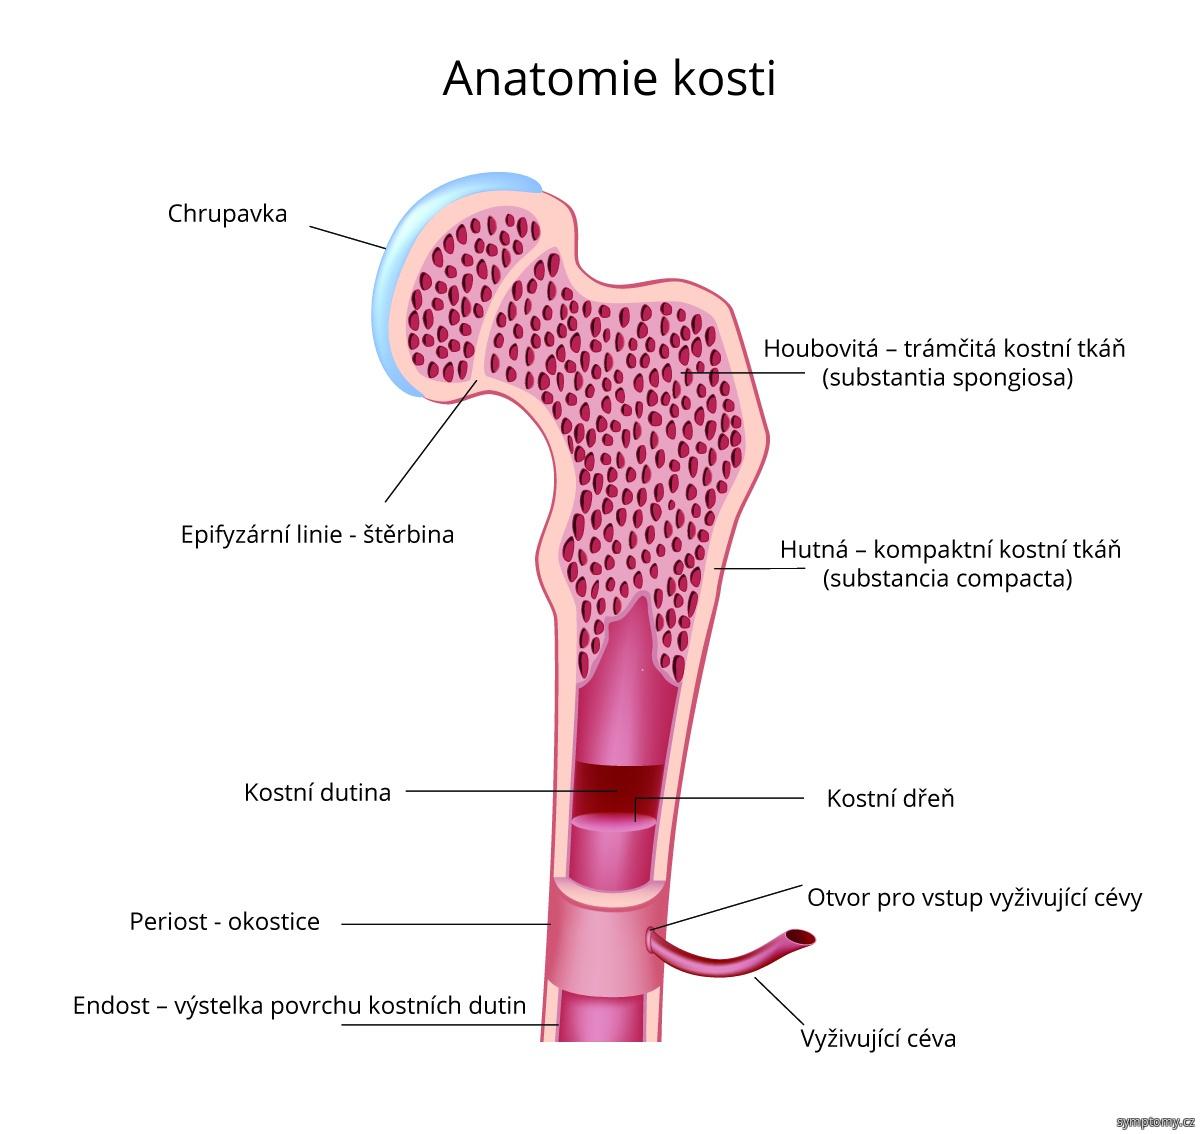 Anatomie kosti